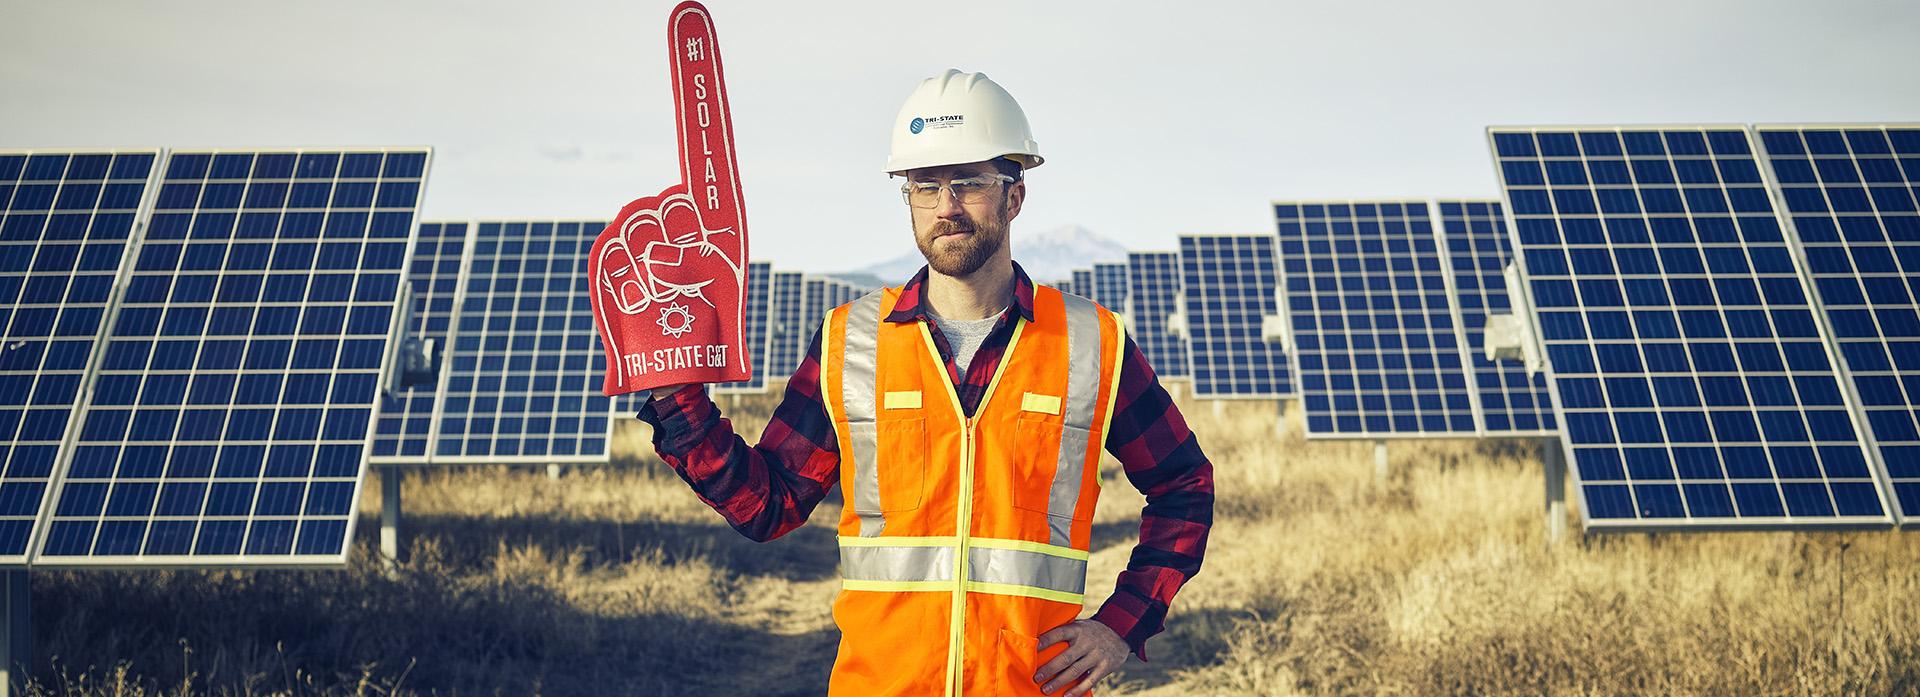 https://www.tristate.coop/sites/tristategt/files/revslider/image/Randy-solar-hero-030819.jpg